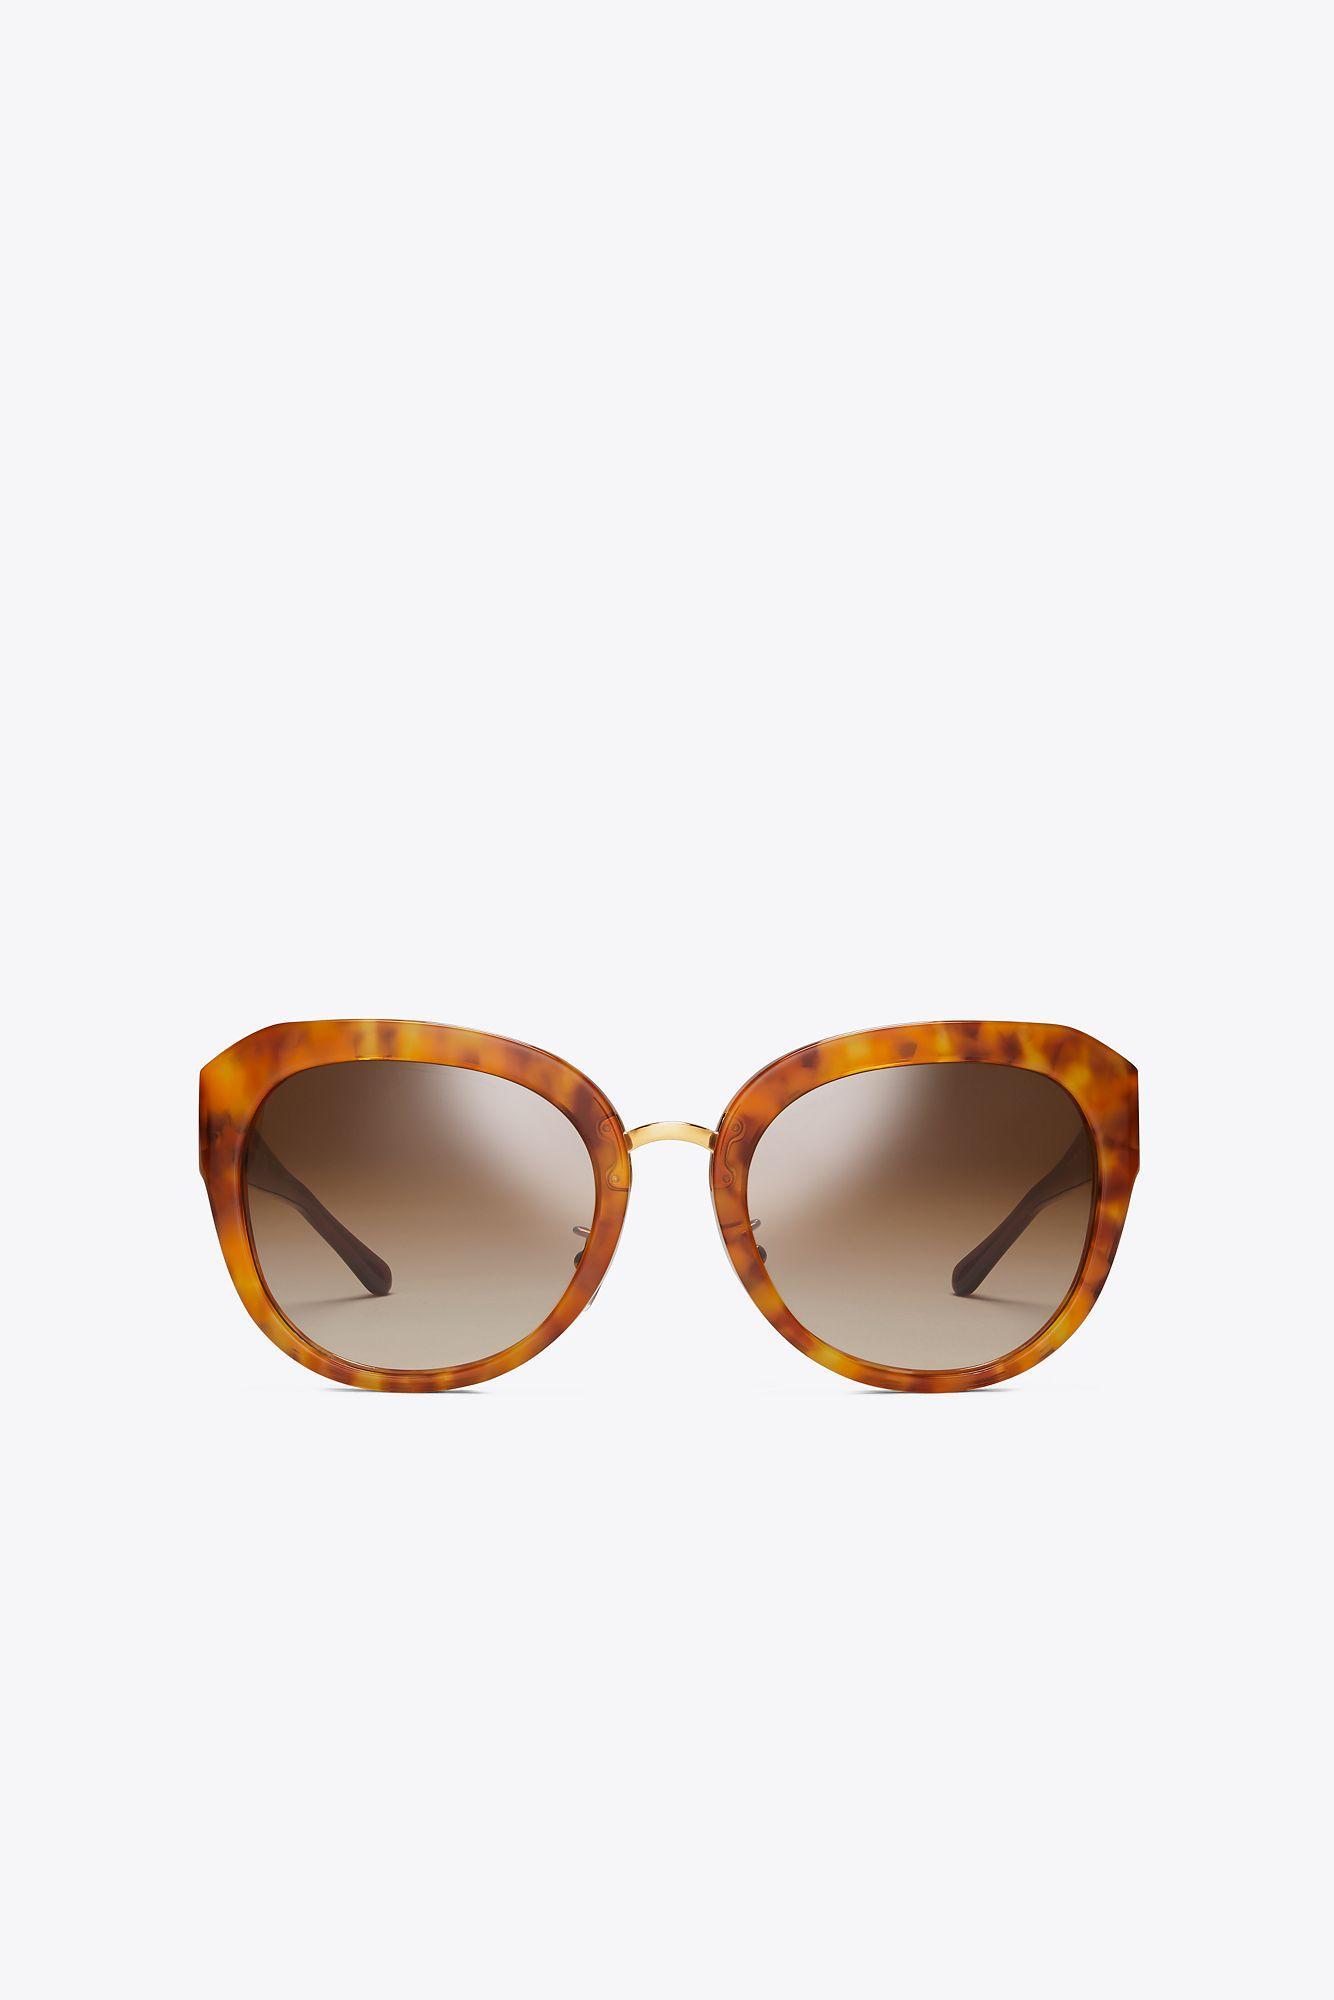 18edb23e3ff6 Lyst - Tory Burch 3 Piece Logo Irregular | 212 | Sunglasses in Brown